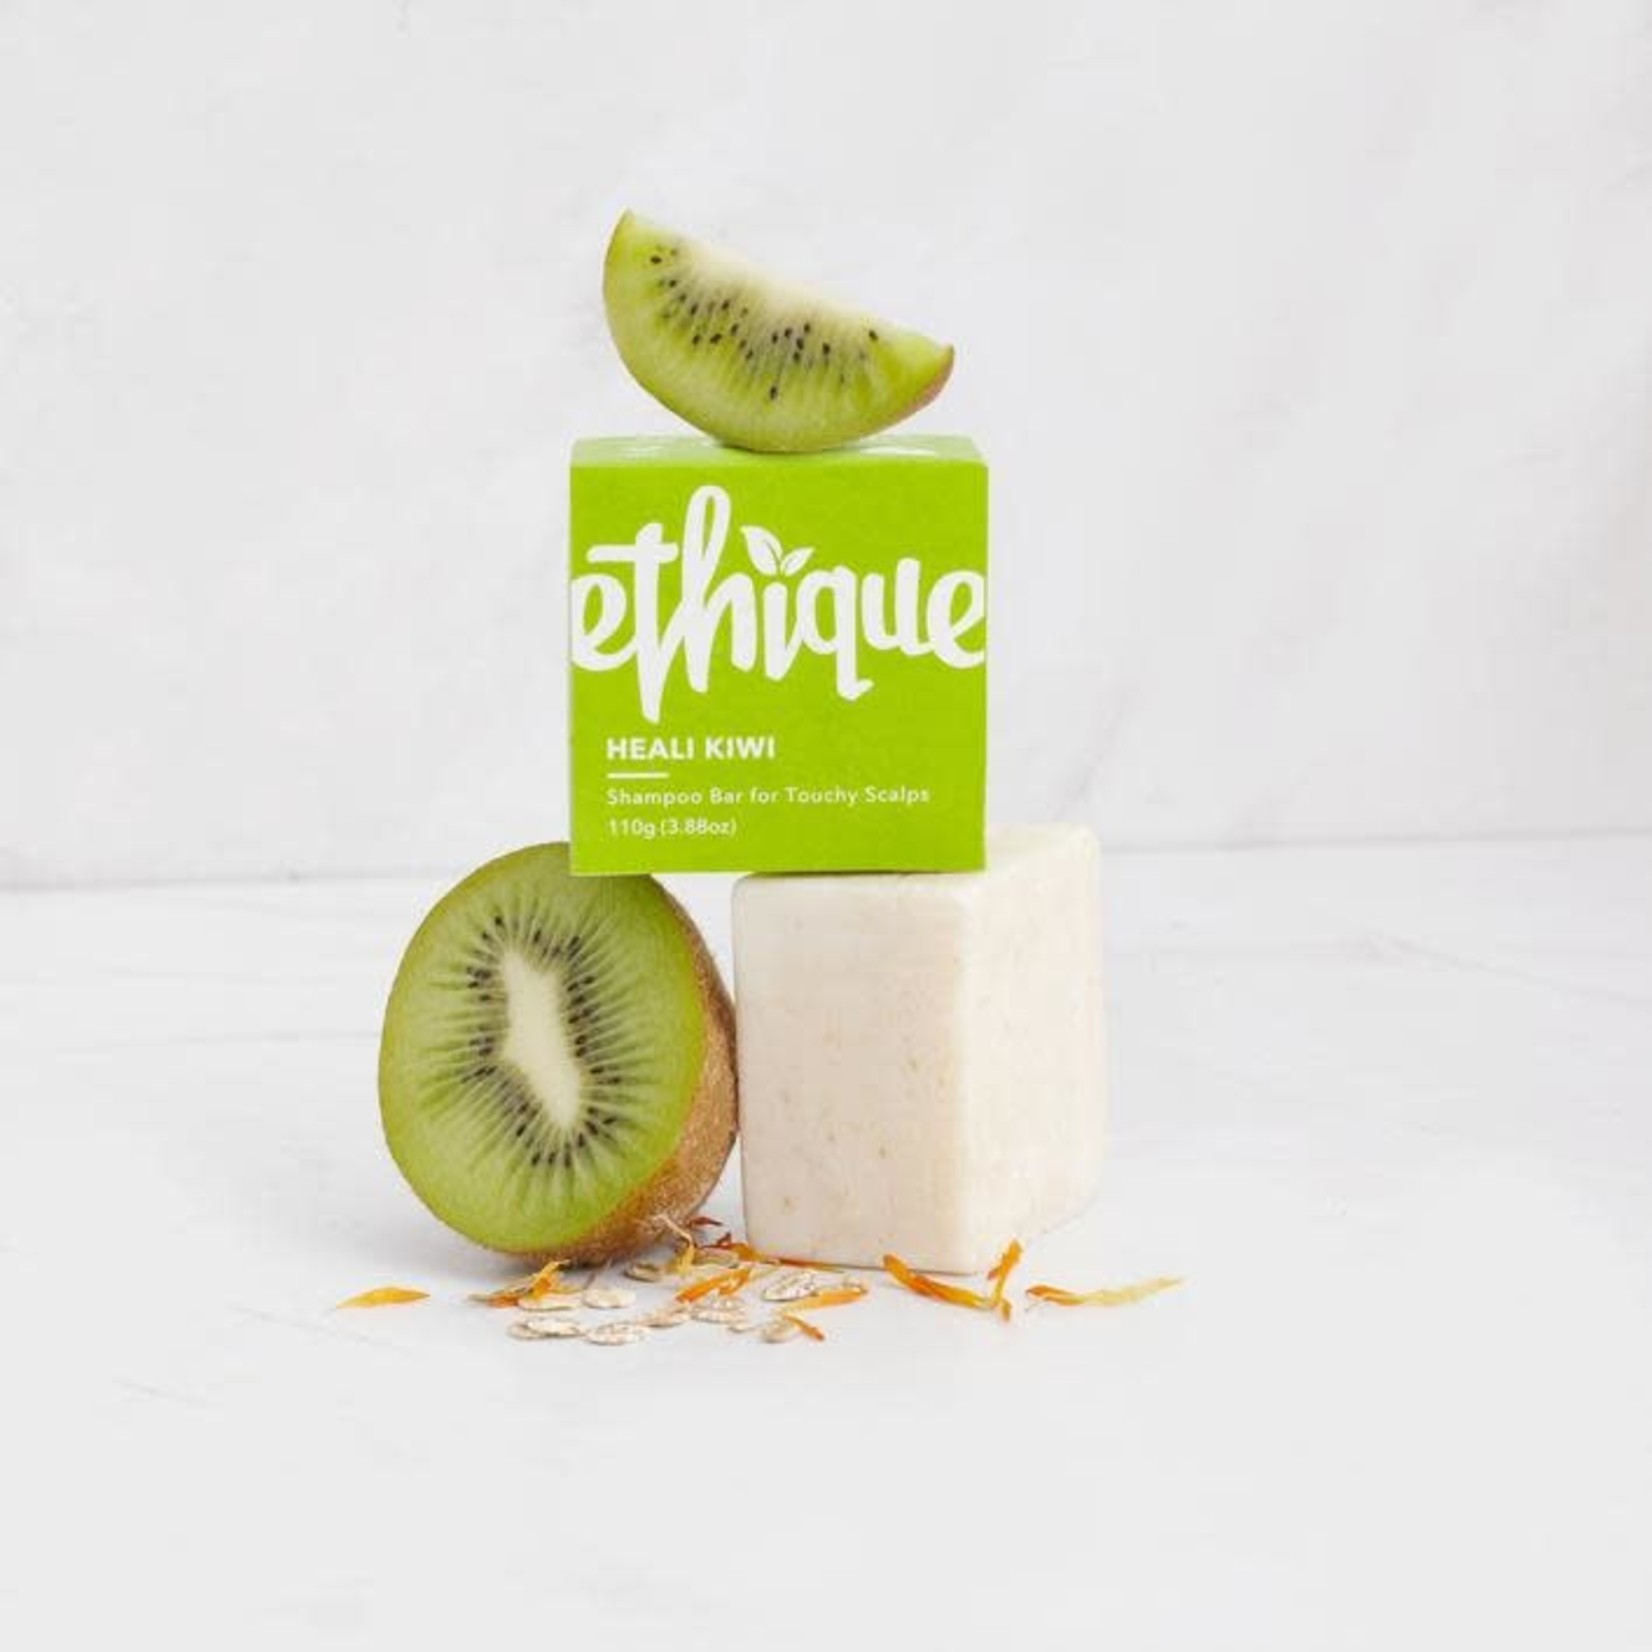 Ethique Ethique Shampoo Bar Heali Kiwi - For Touchy Scalps